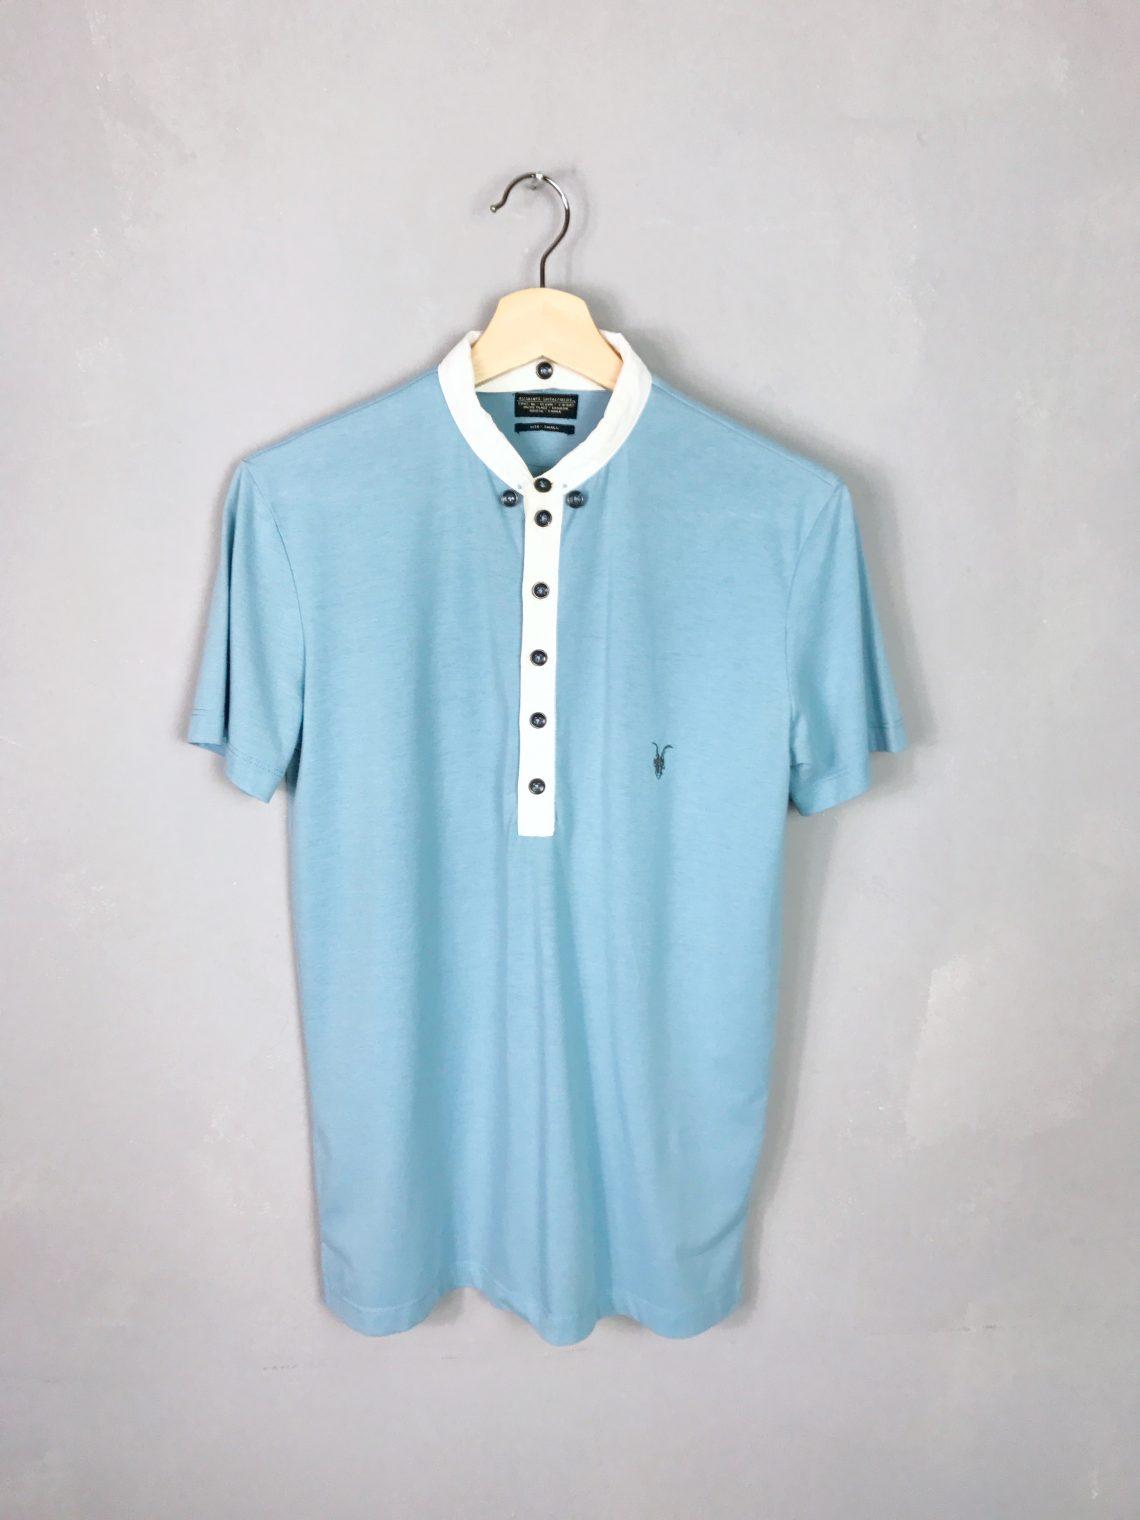 ALL SAINTS Poloshirt hellblau flexibler Kragen